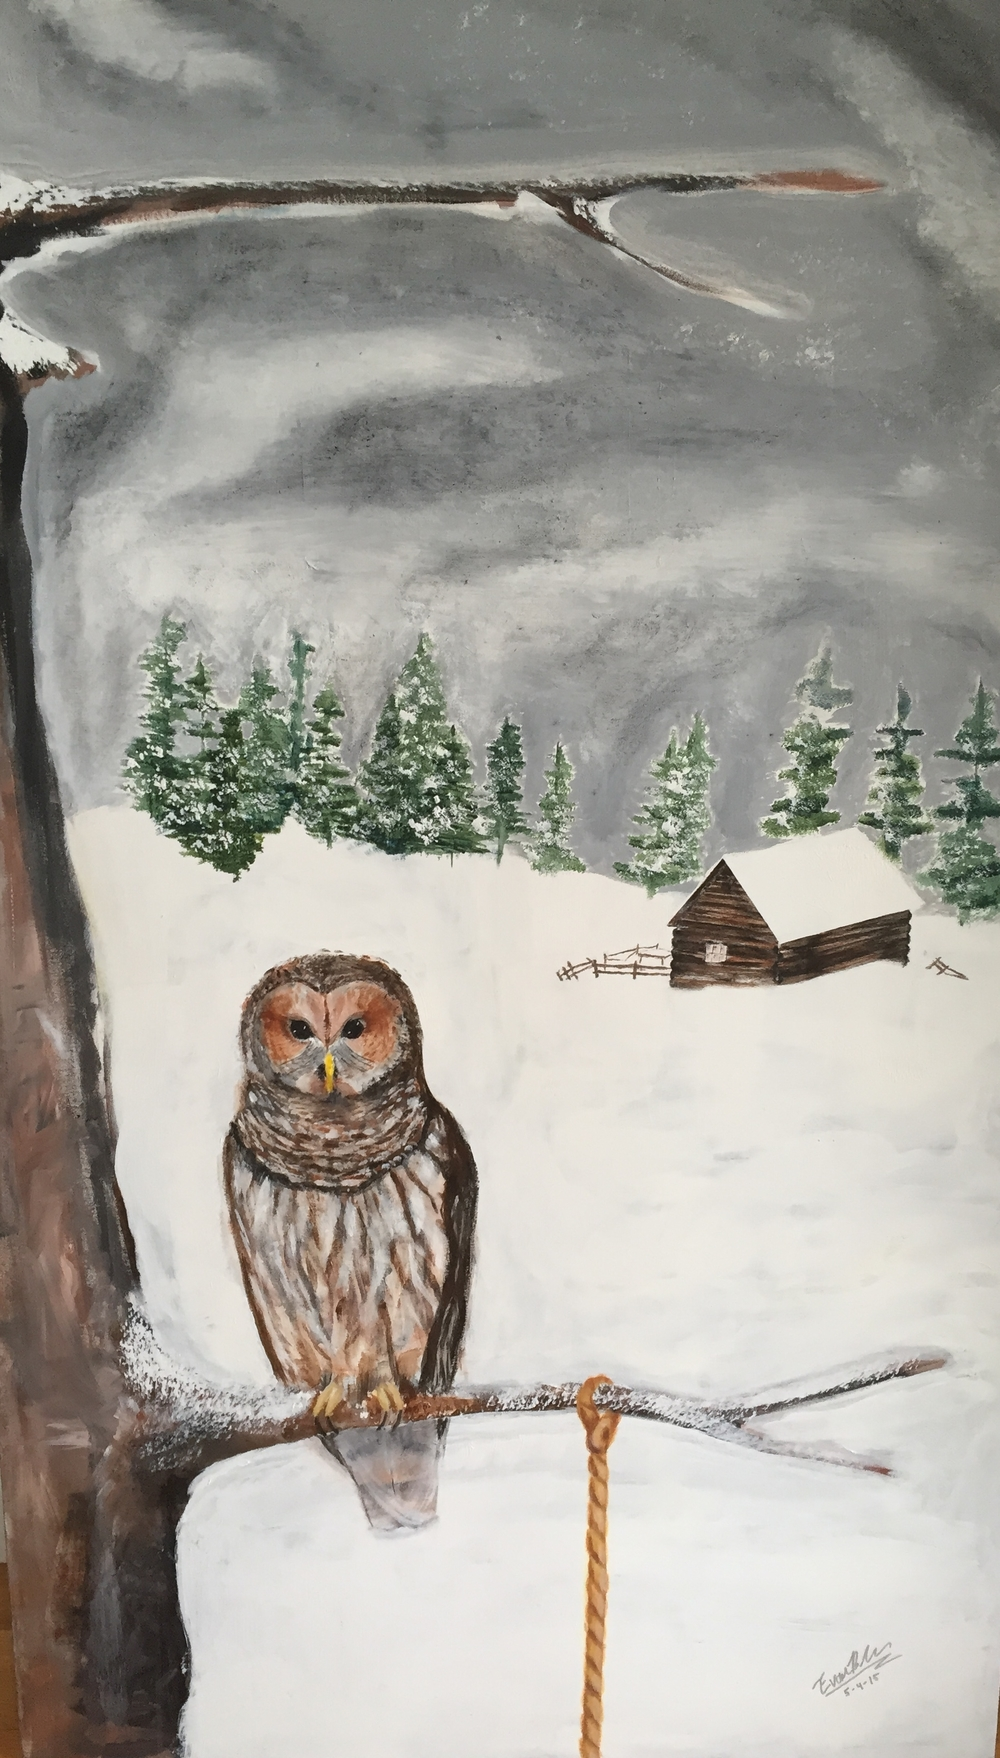 Owl & Tree, 2015